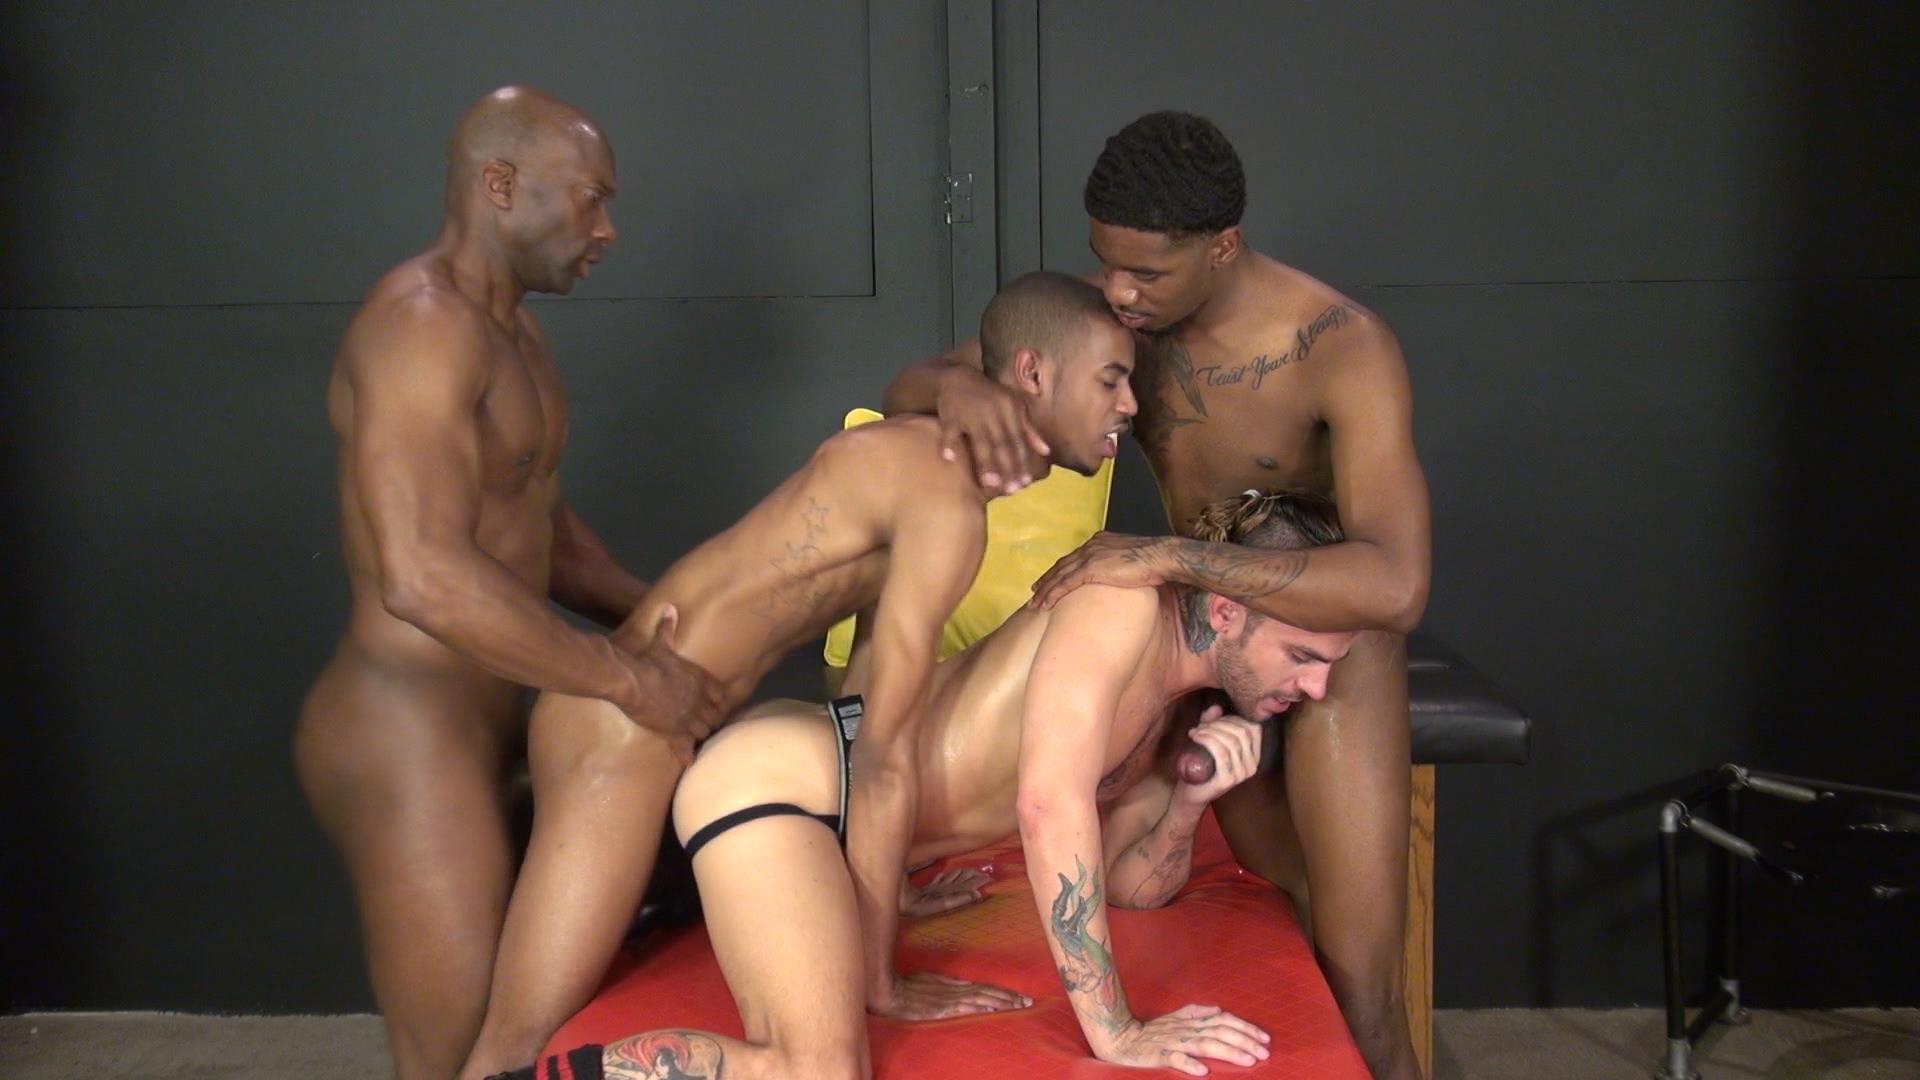 Raw-and-Rough-Champ-Robinson-Lukas-Cipriani-Knockout-Tigger-Redd-BBBH-Amateur-Gay-Porn-10 White Boy Gets A Breeding By Three Big Black Dicks